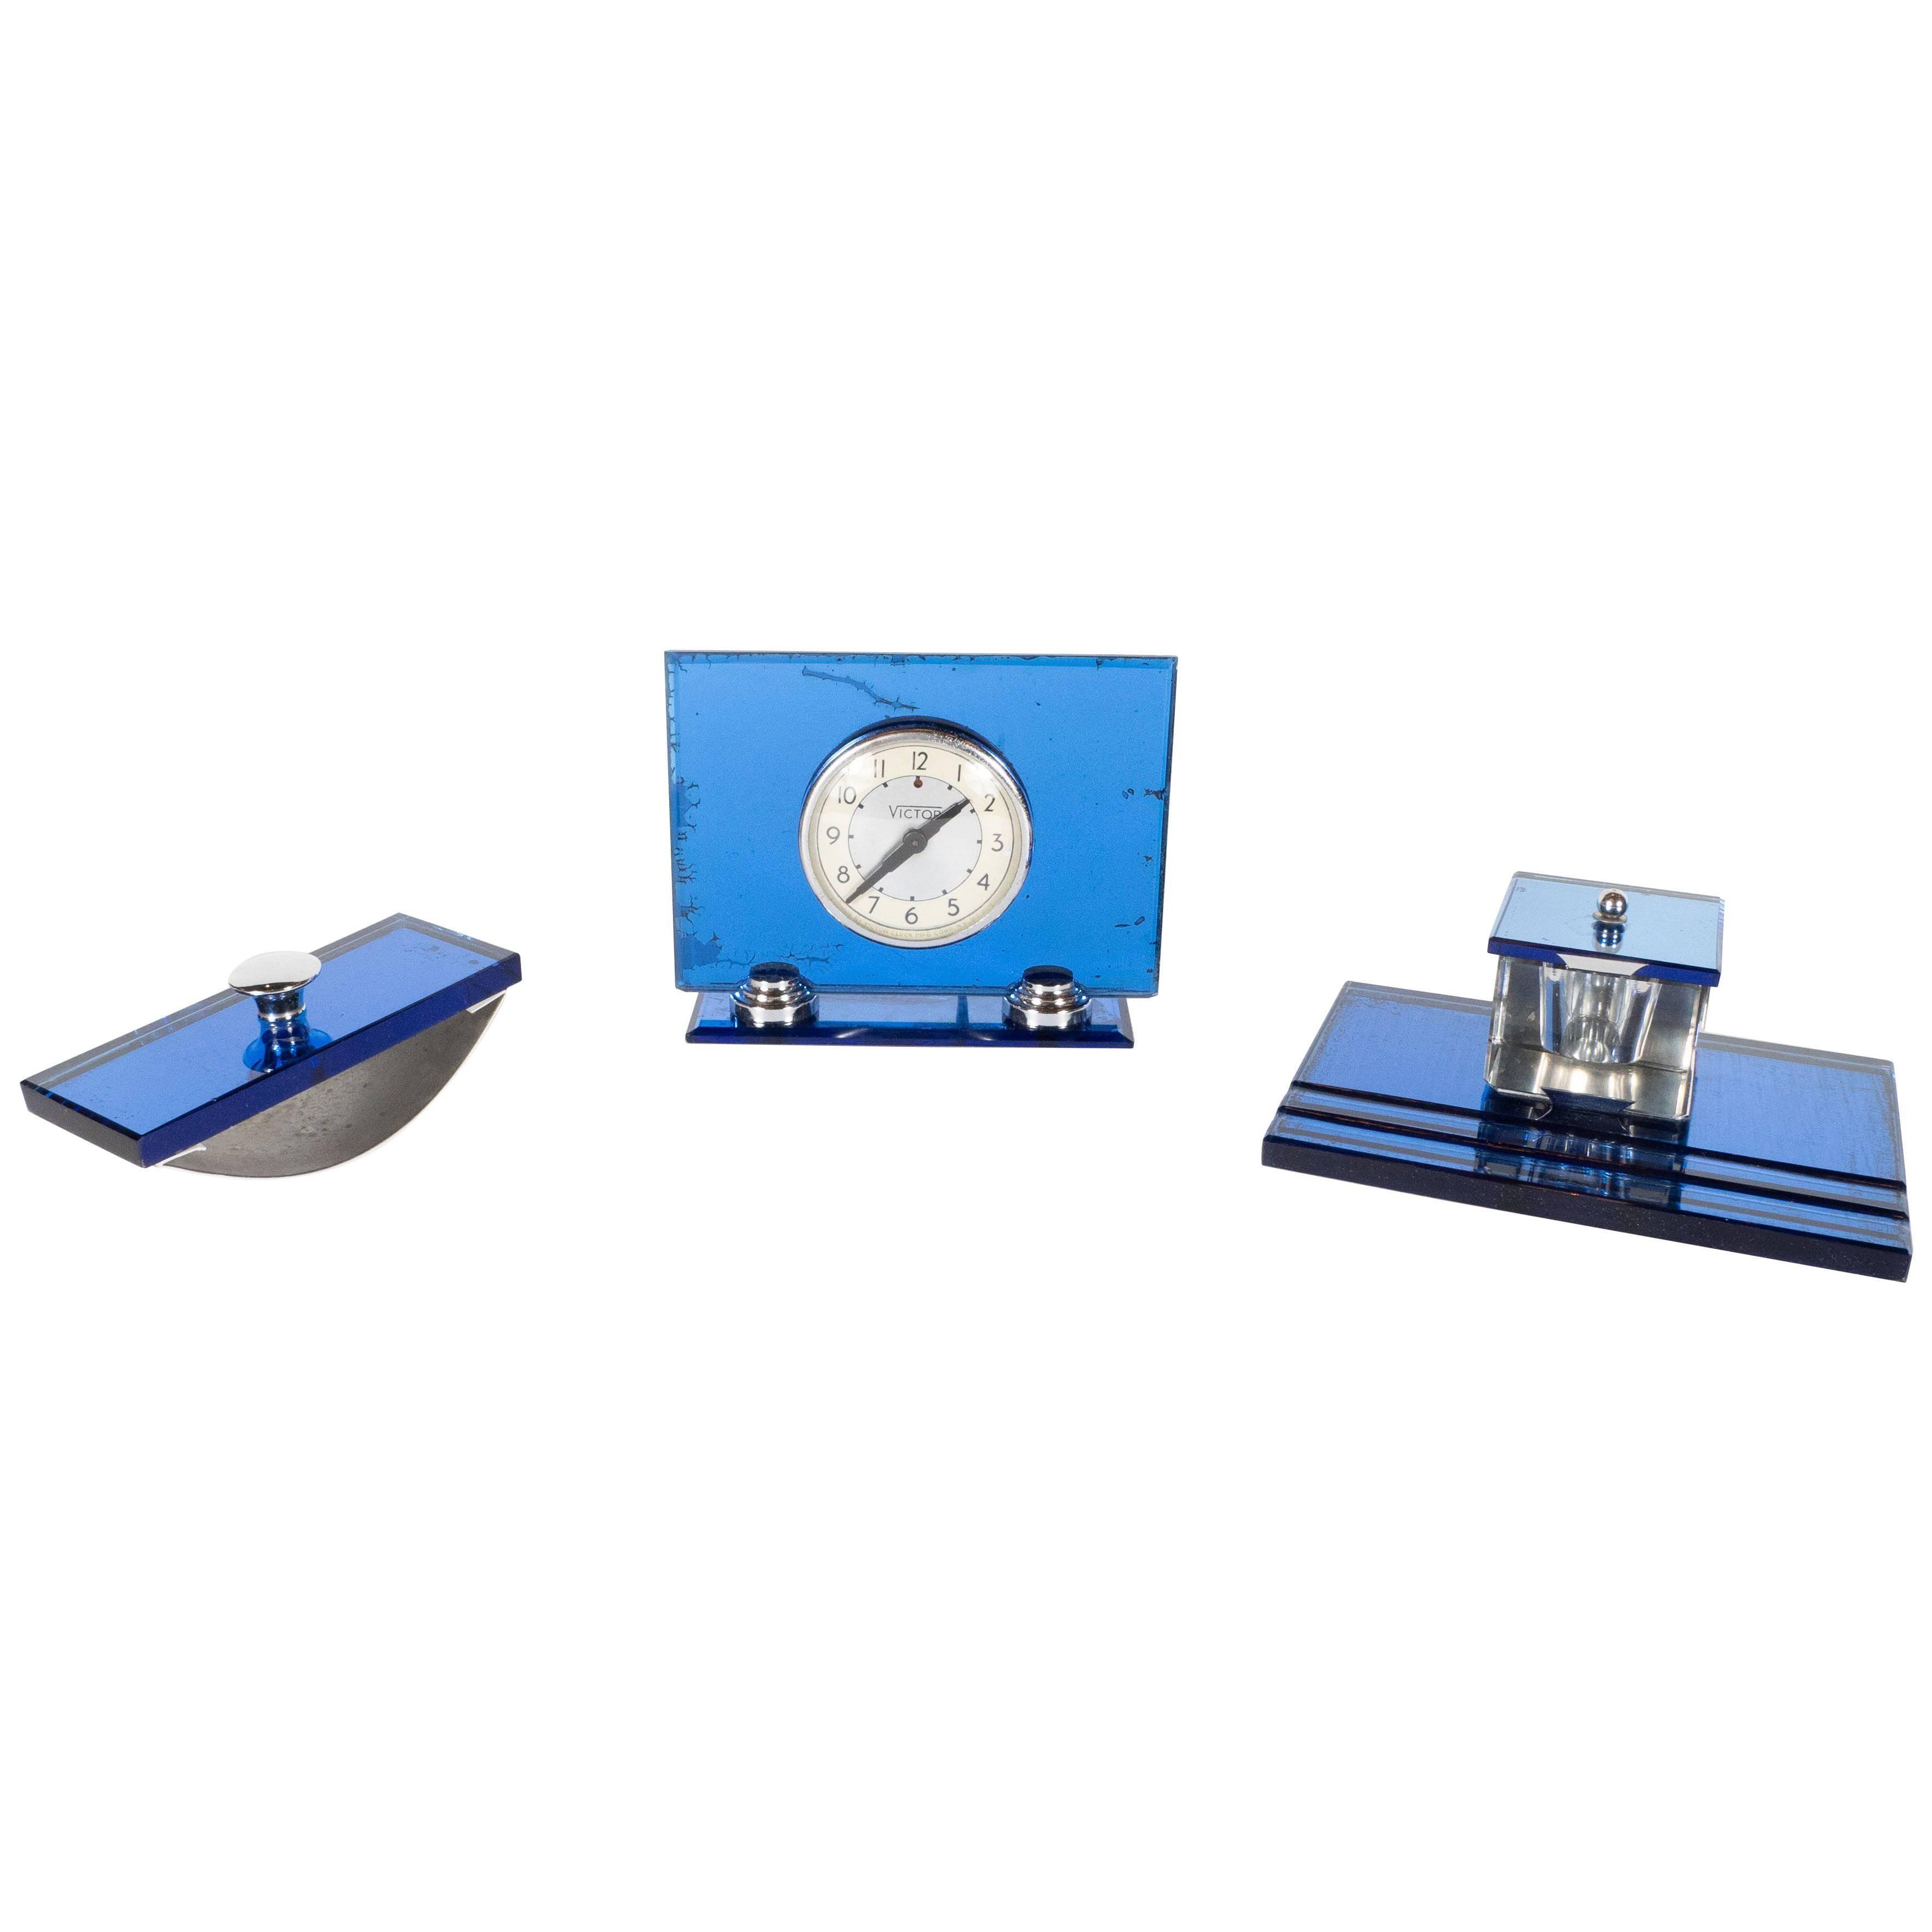 Three-Piece Art Deco Machine Age Cobalt Mirror and Chrome Desk Set by Victor